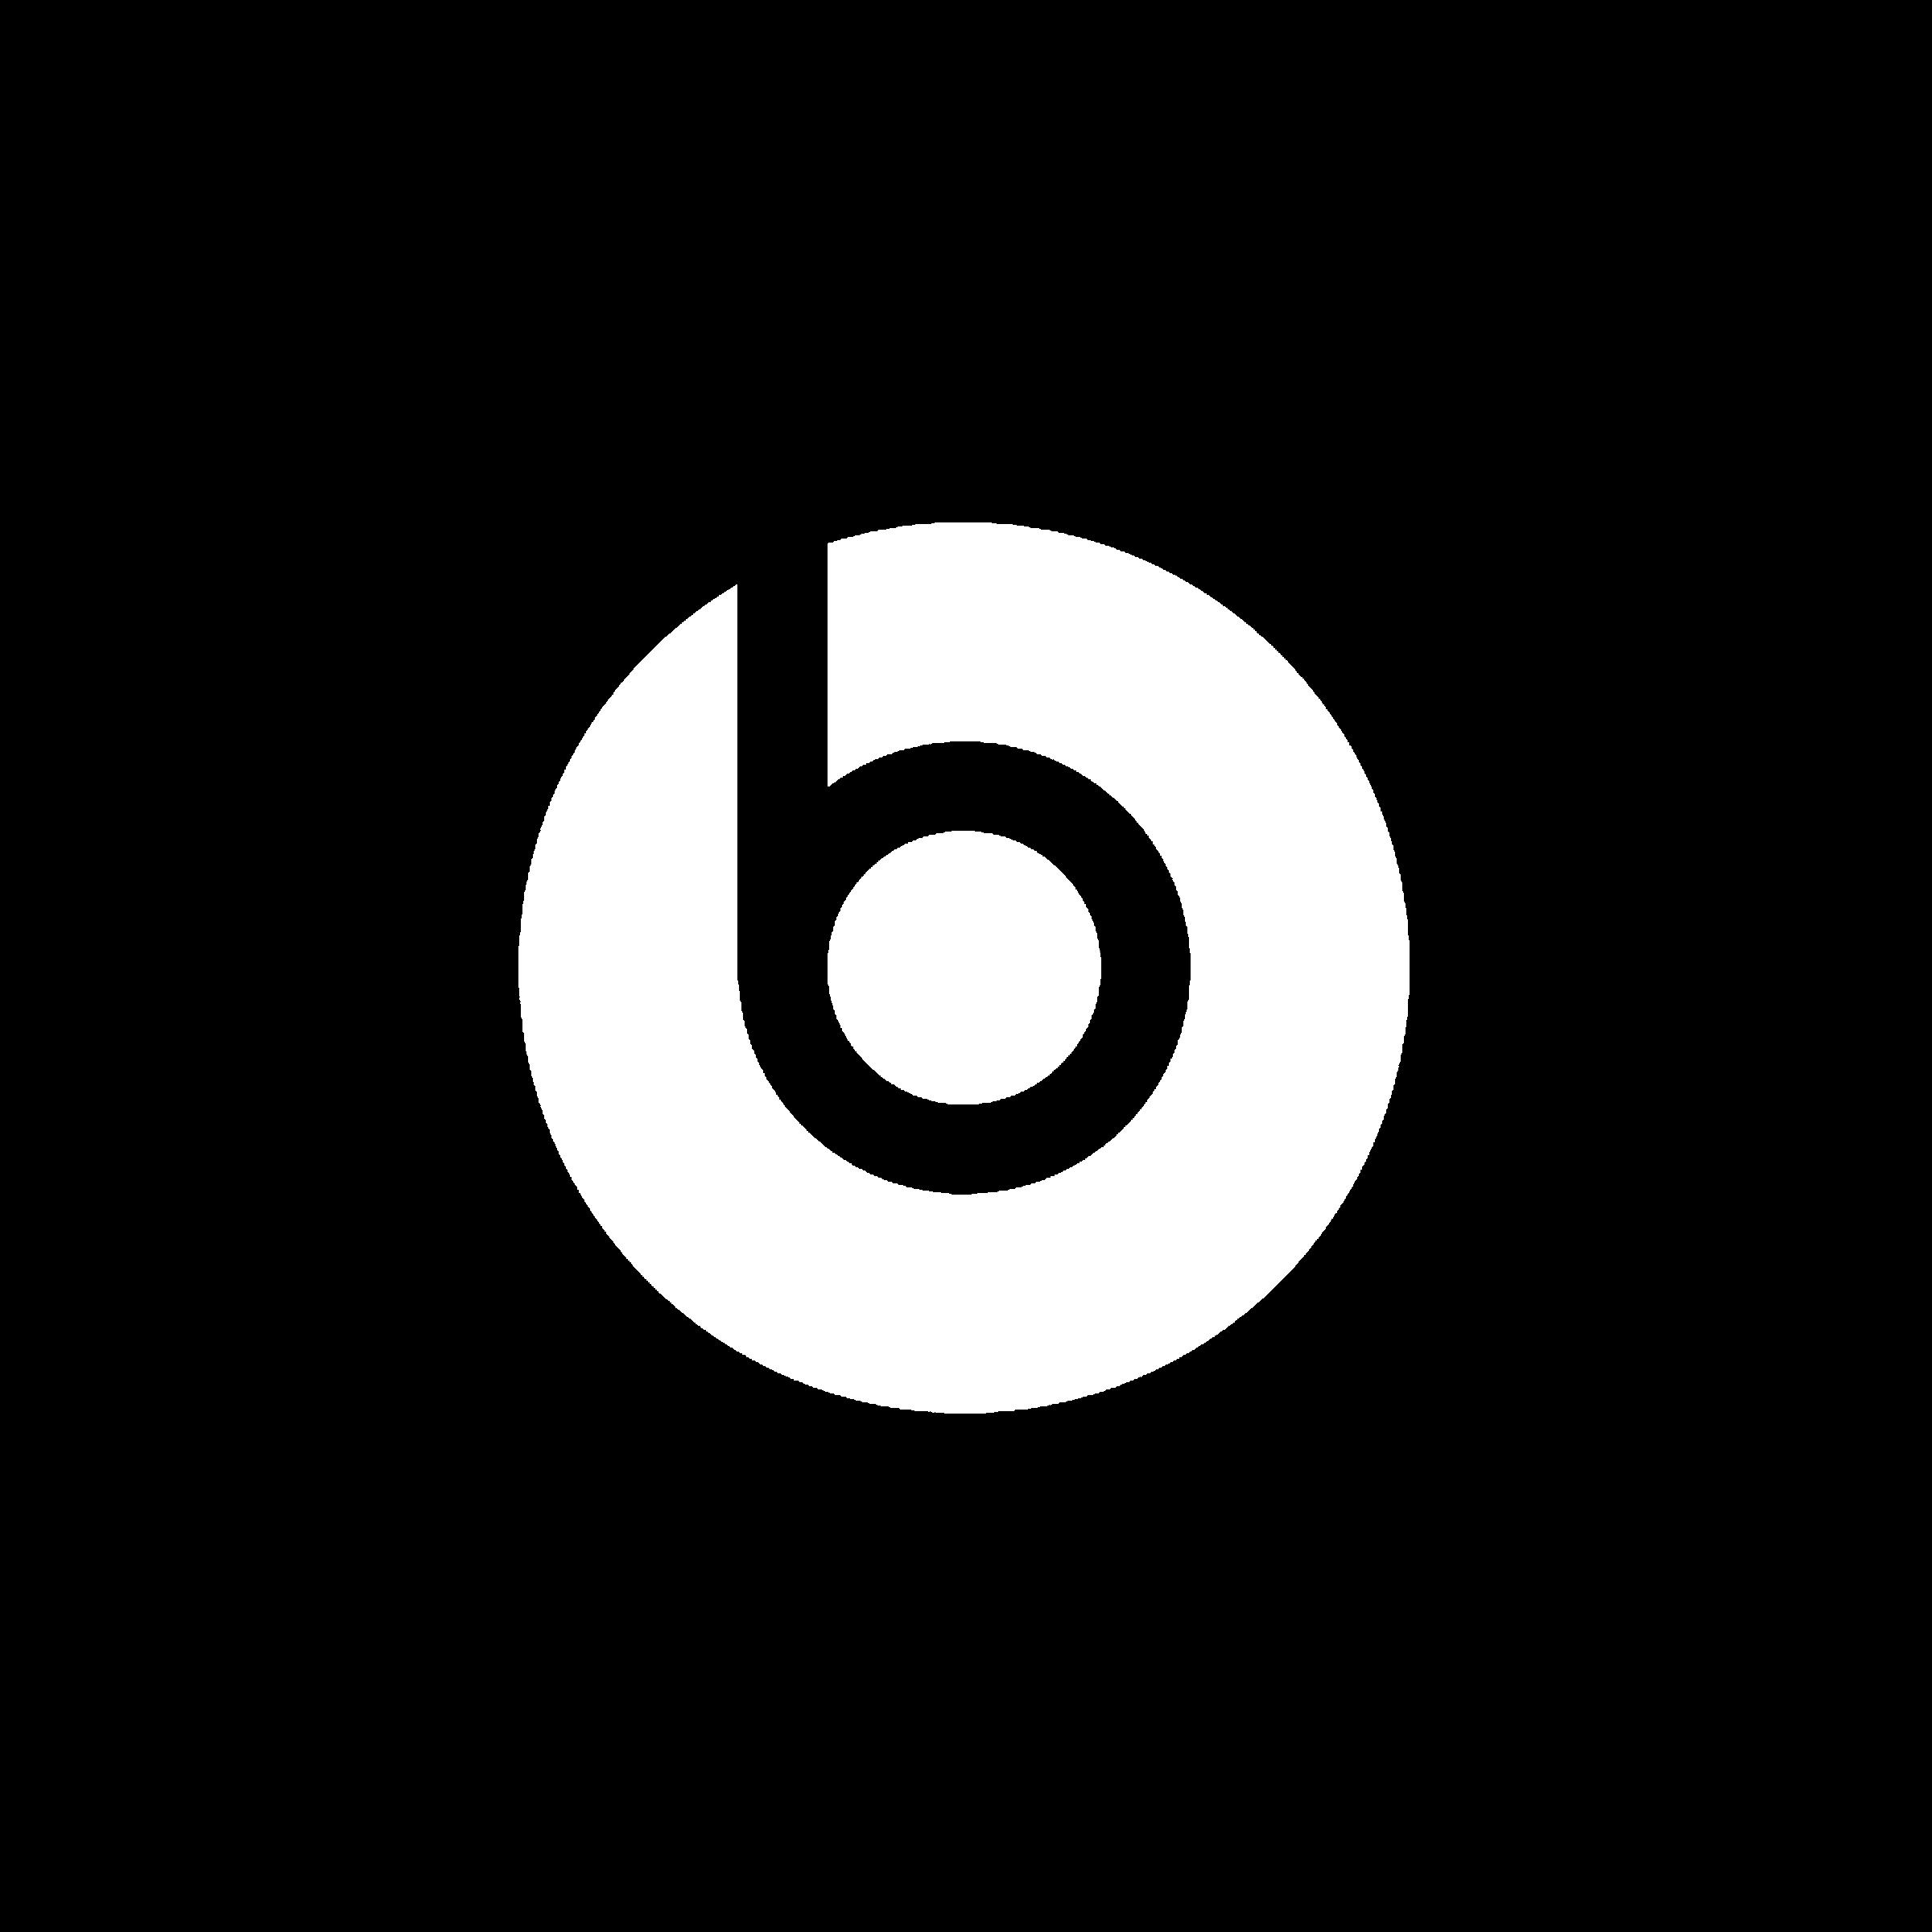 beats-logo-white